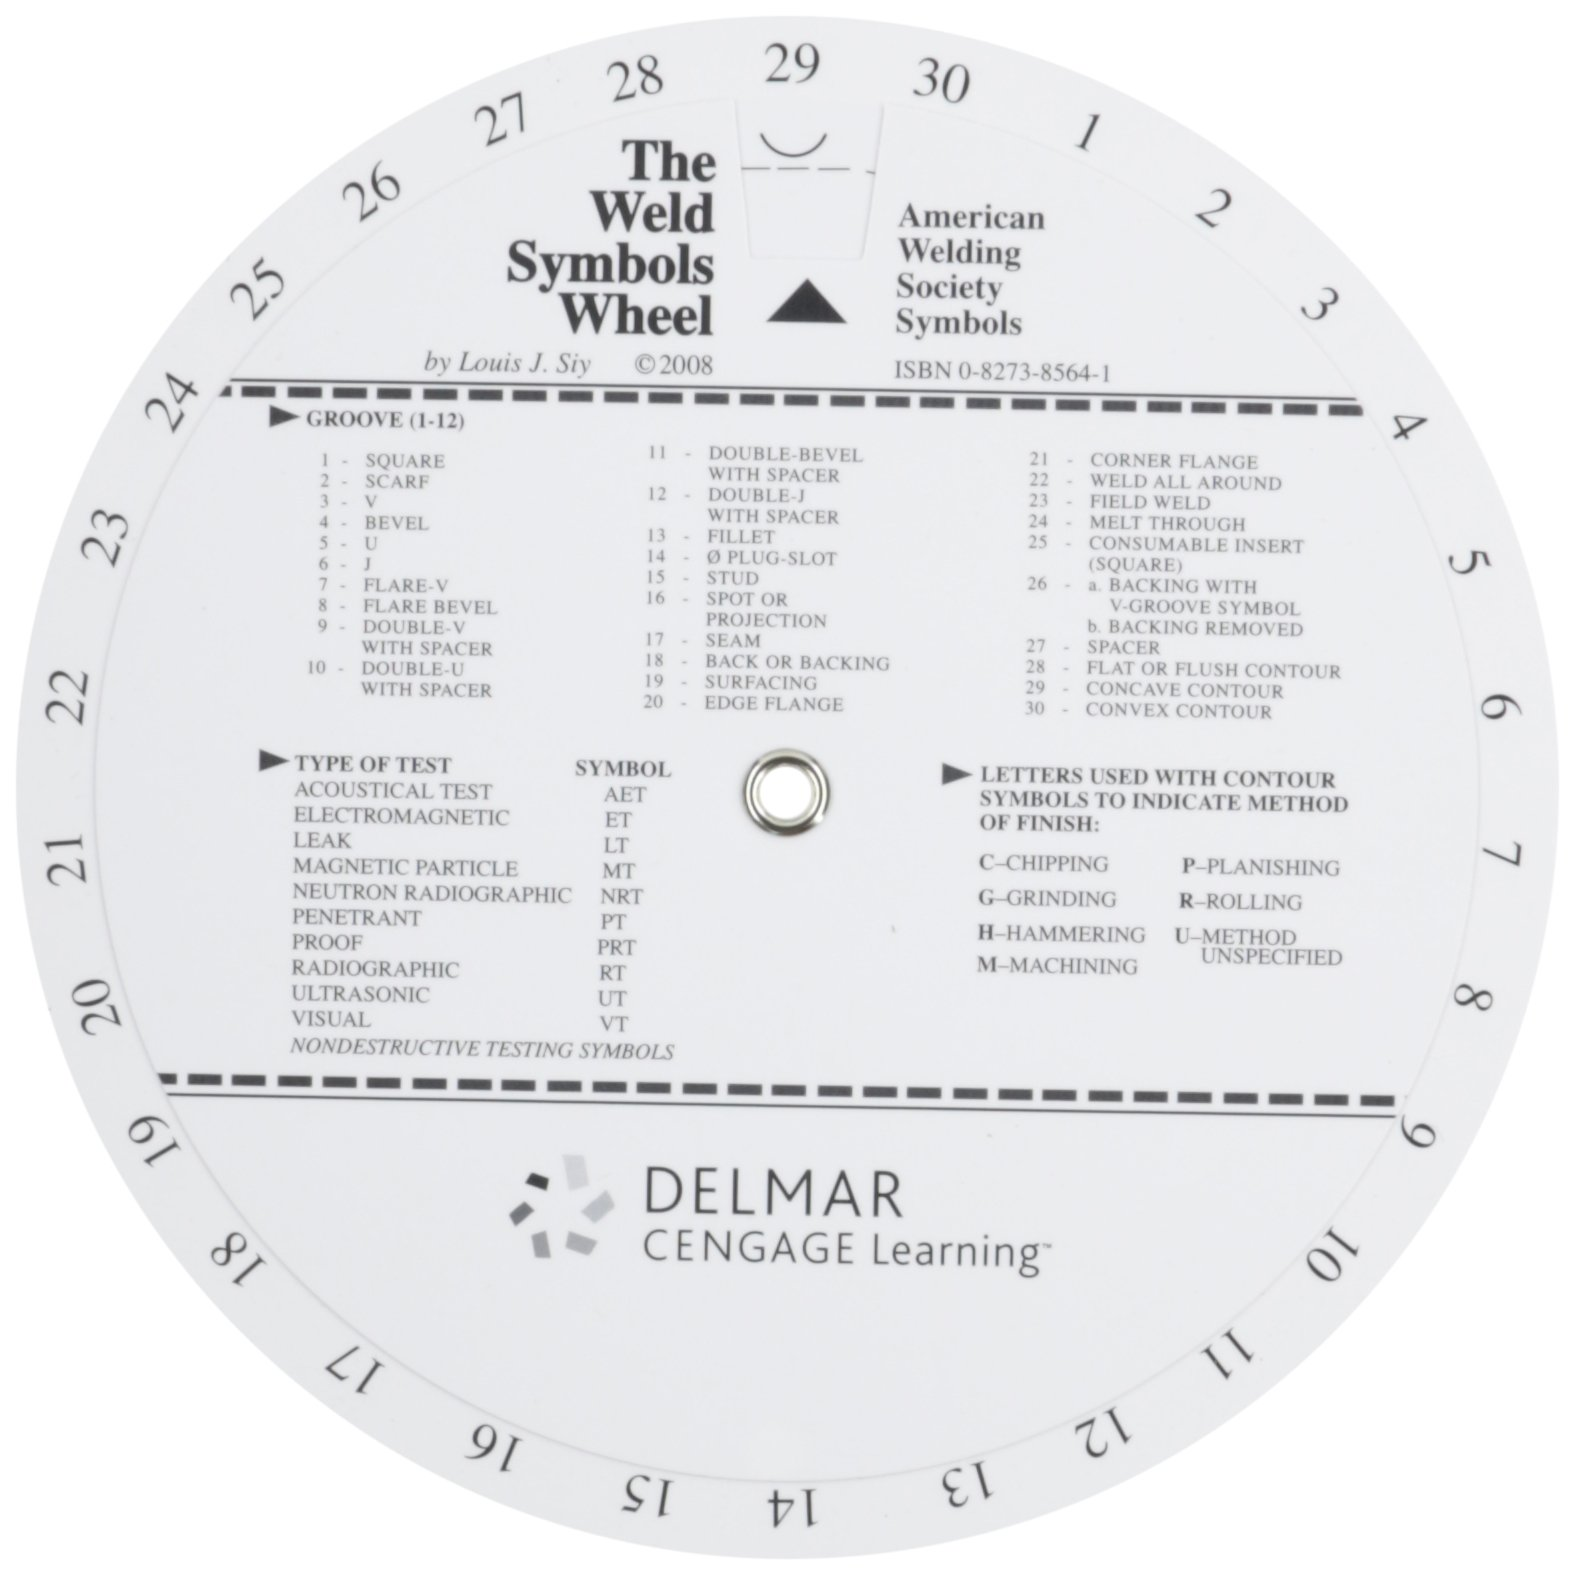 Buy the weld symbols wheel delmars blueprint reading book buy the weld symbols wheel delmars blueprint reading book online at low prices in india the weld symbols wheel delmars blueprint reading reviews buycottarizona Image collections